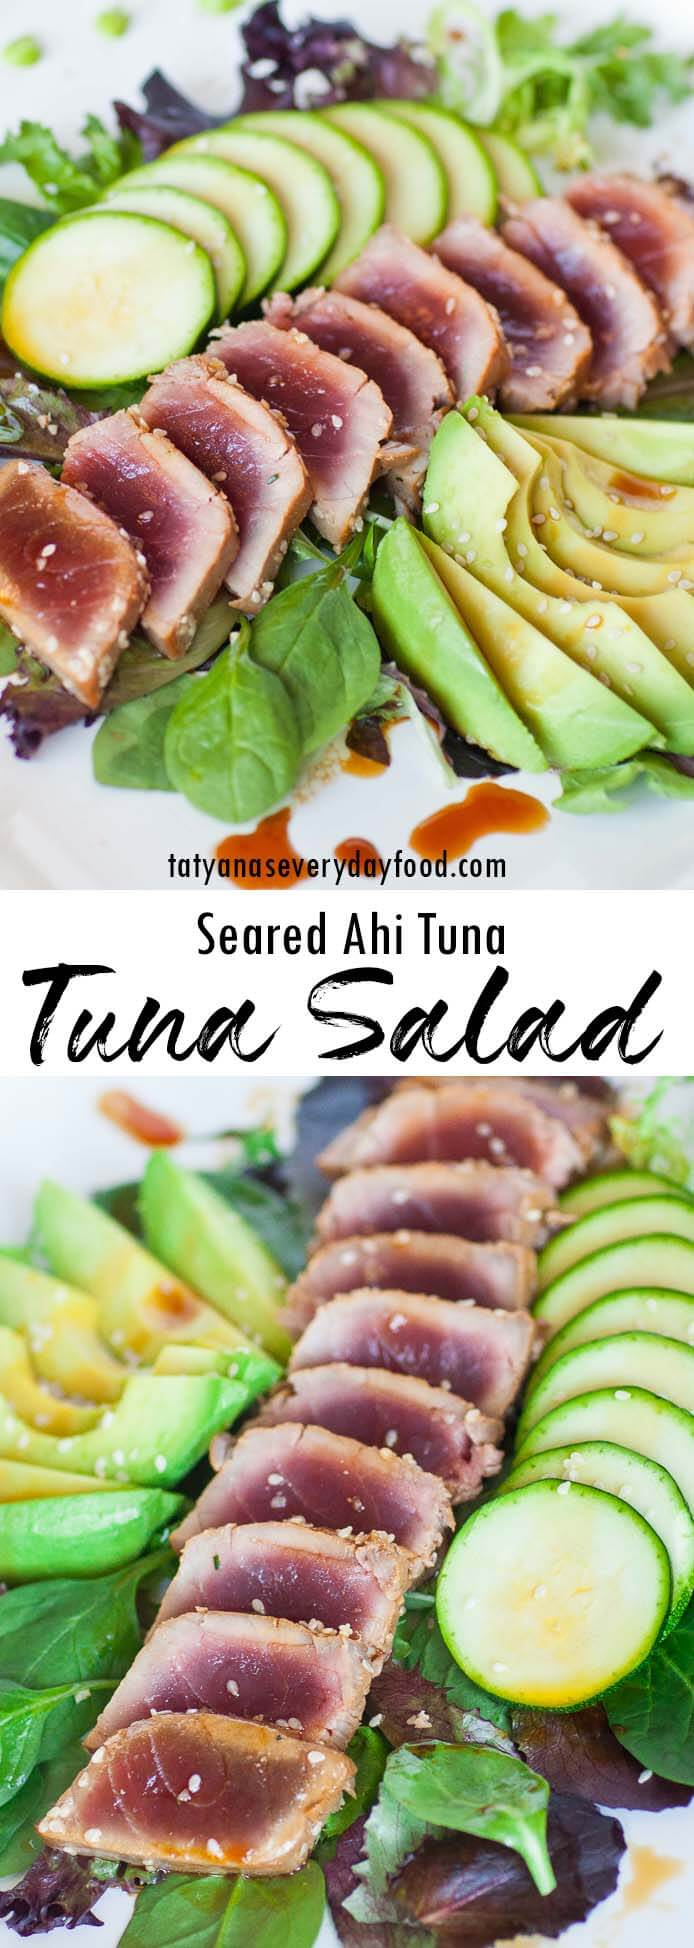 Seared Ahi Tuna Salad recipe